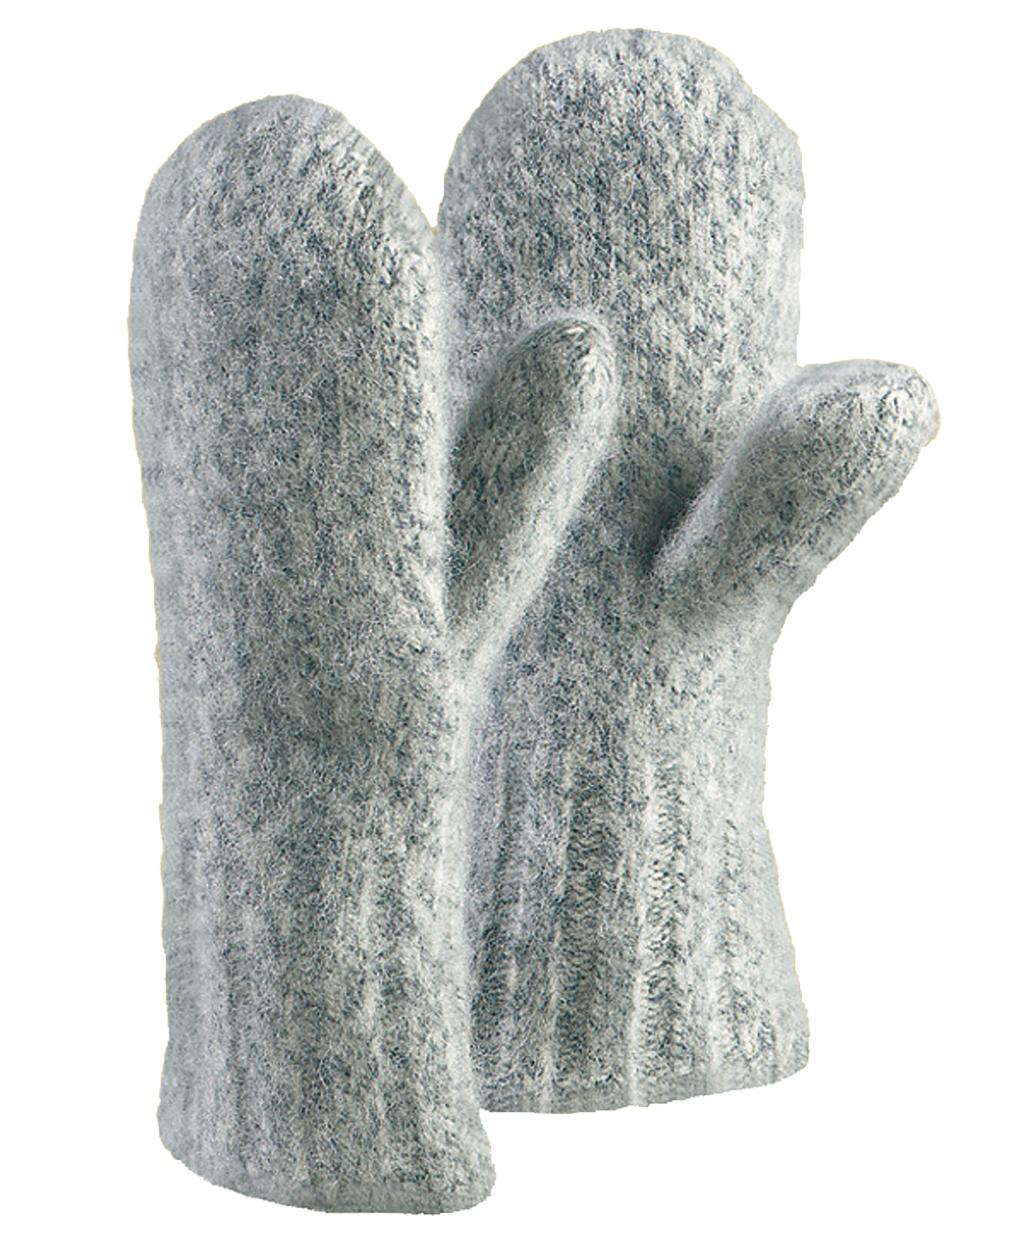 long-mittens Best 10 Ideas for Choosing Winter Gifts